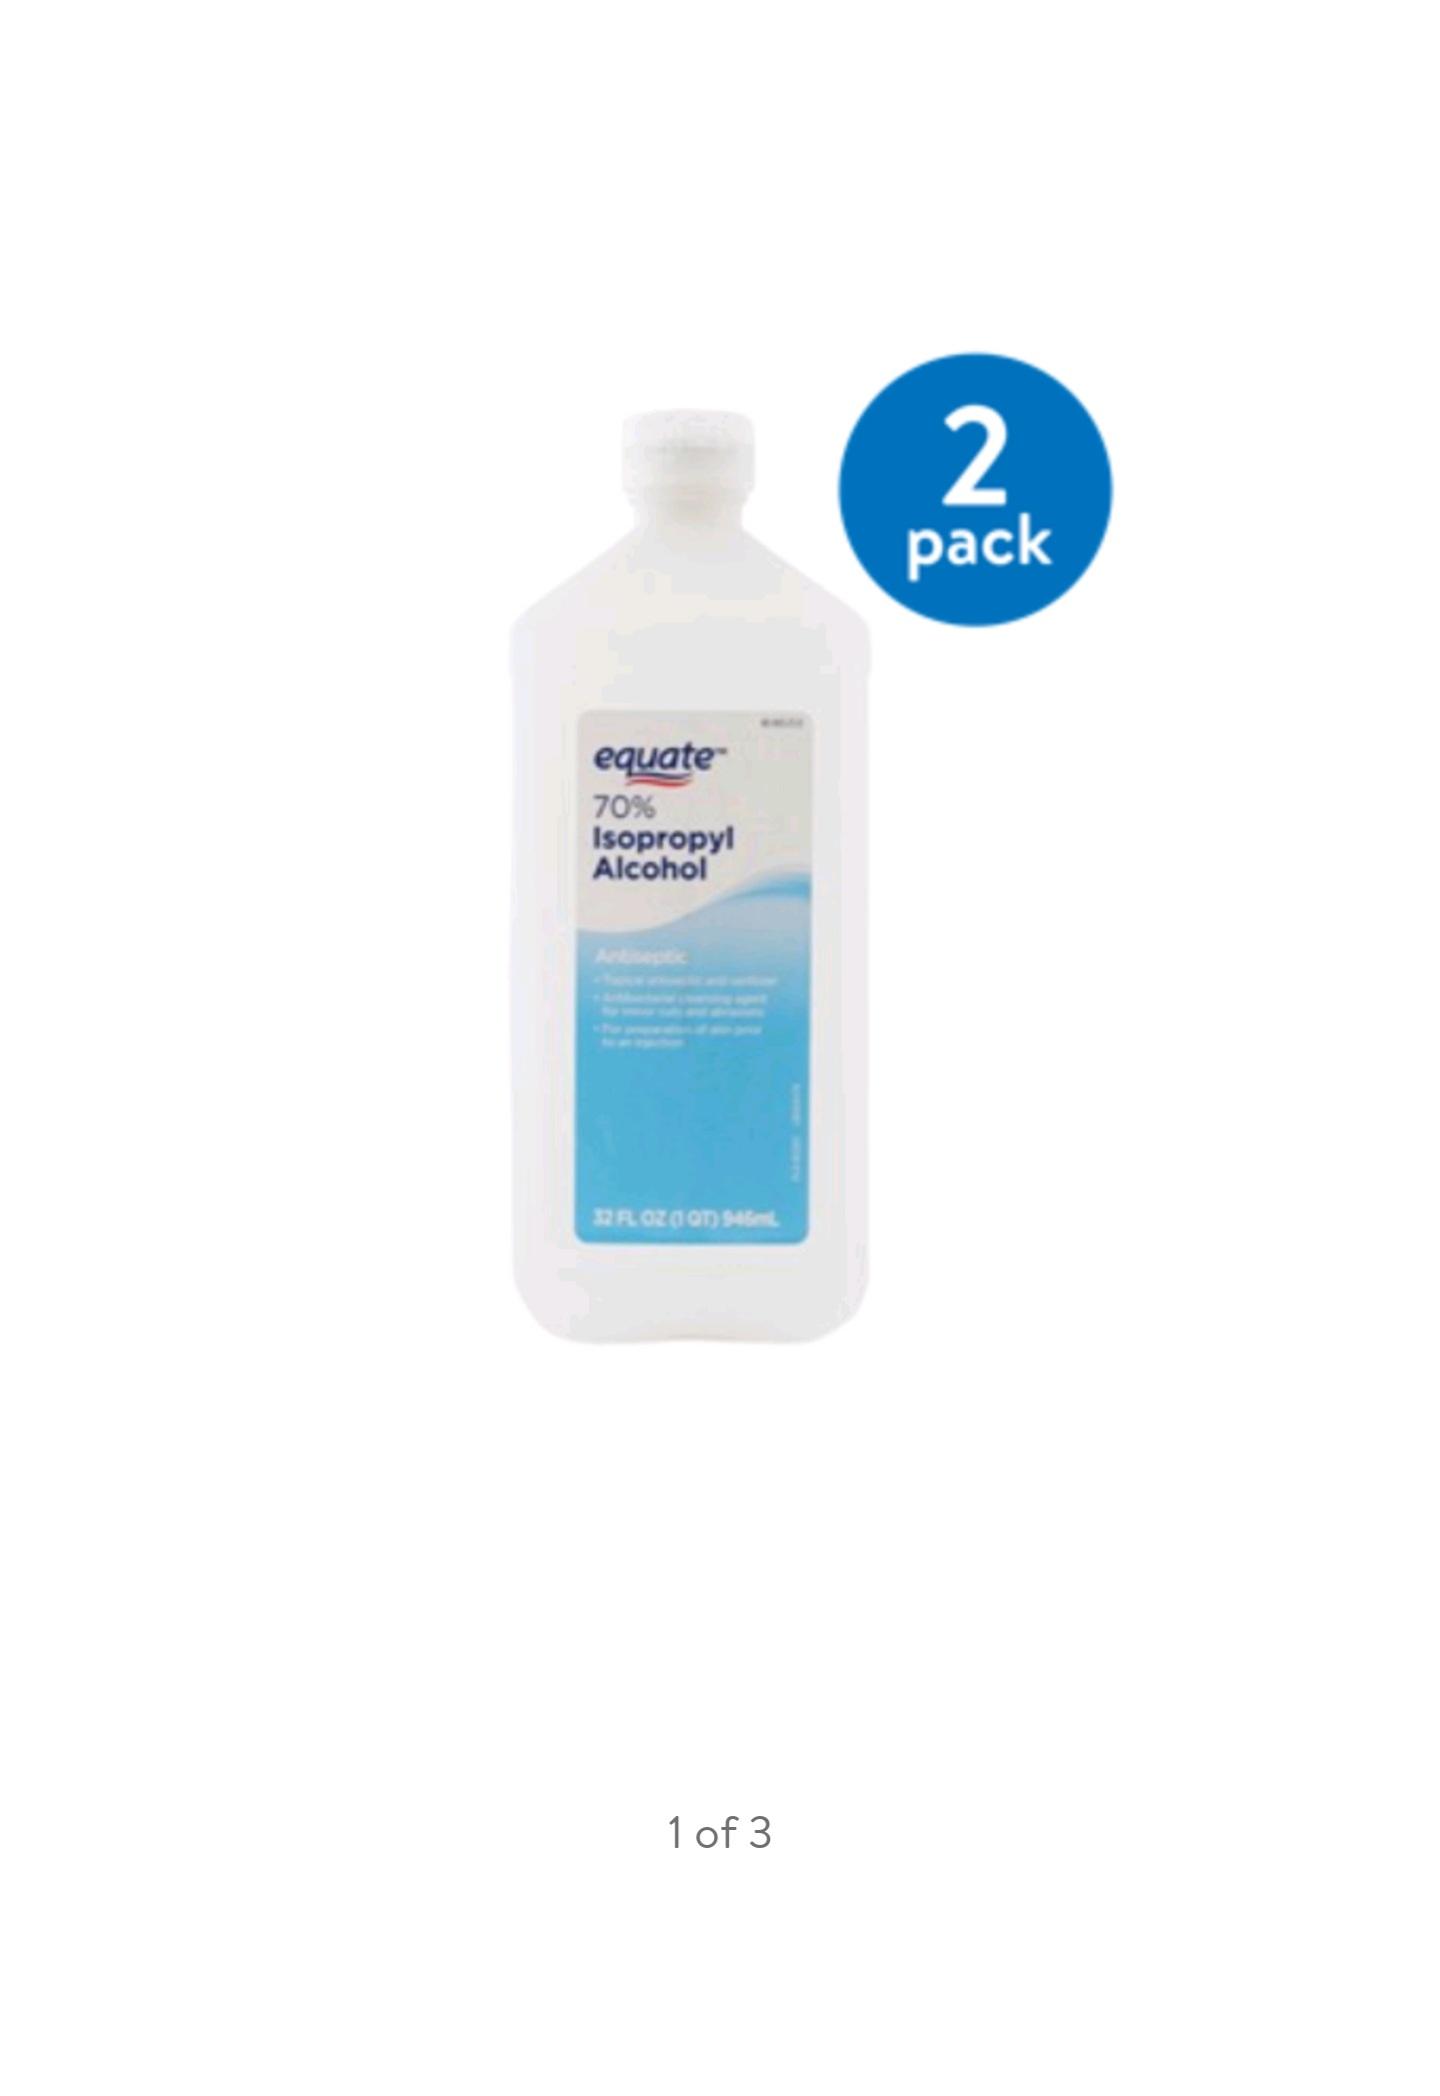 Equate 70% Isopropyl Alcohol Antiseptic, 32 fl oz (2 pack, 64 oz total) for $3.92 at Walmart.com